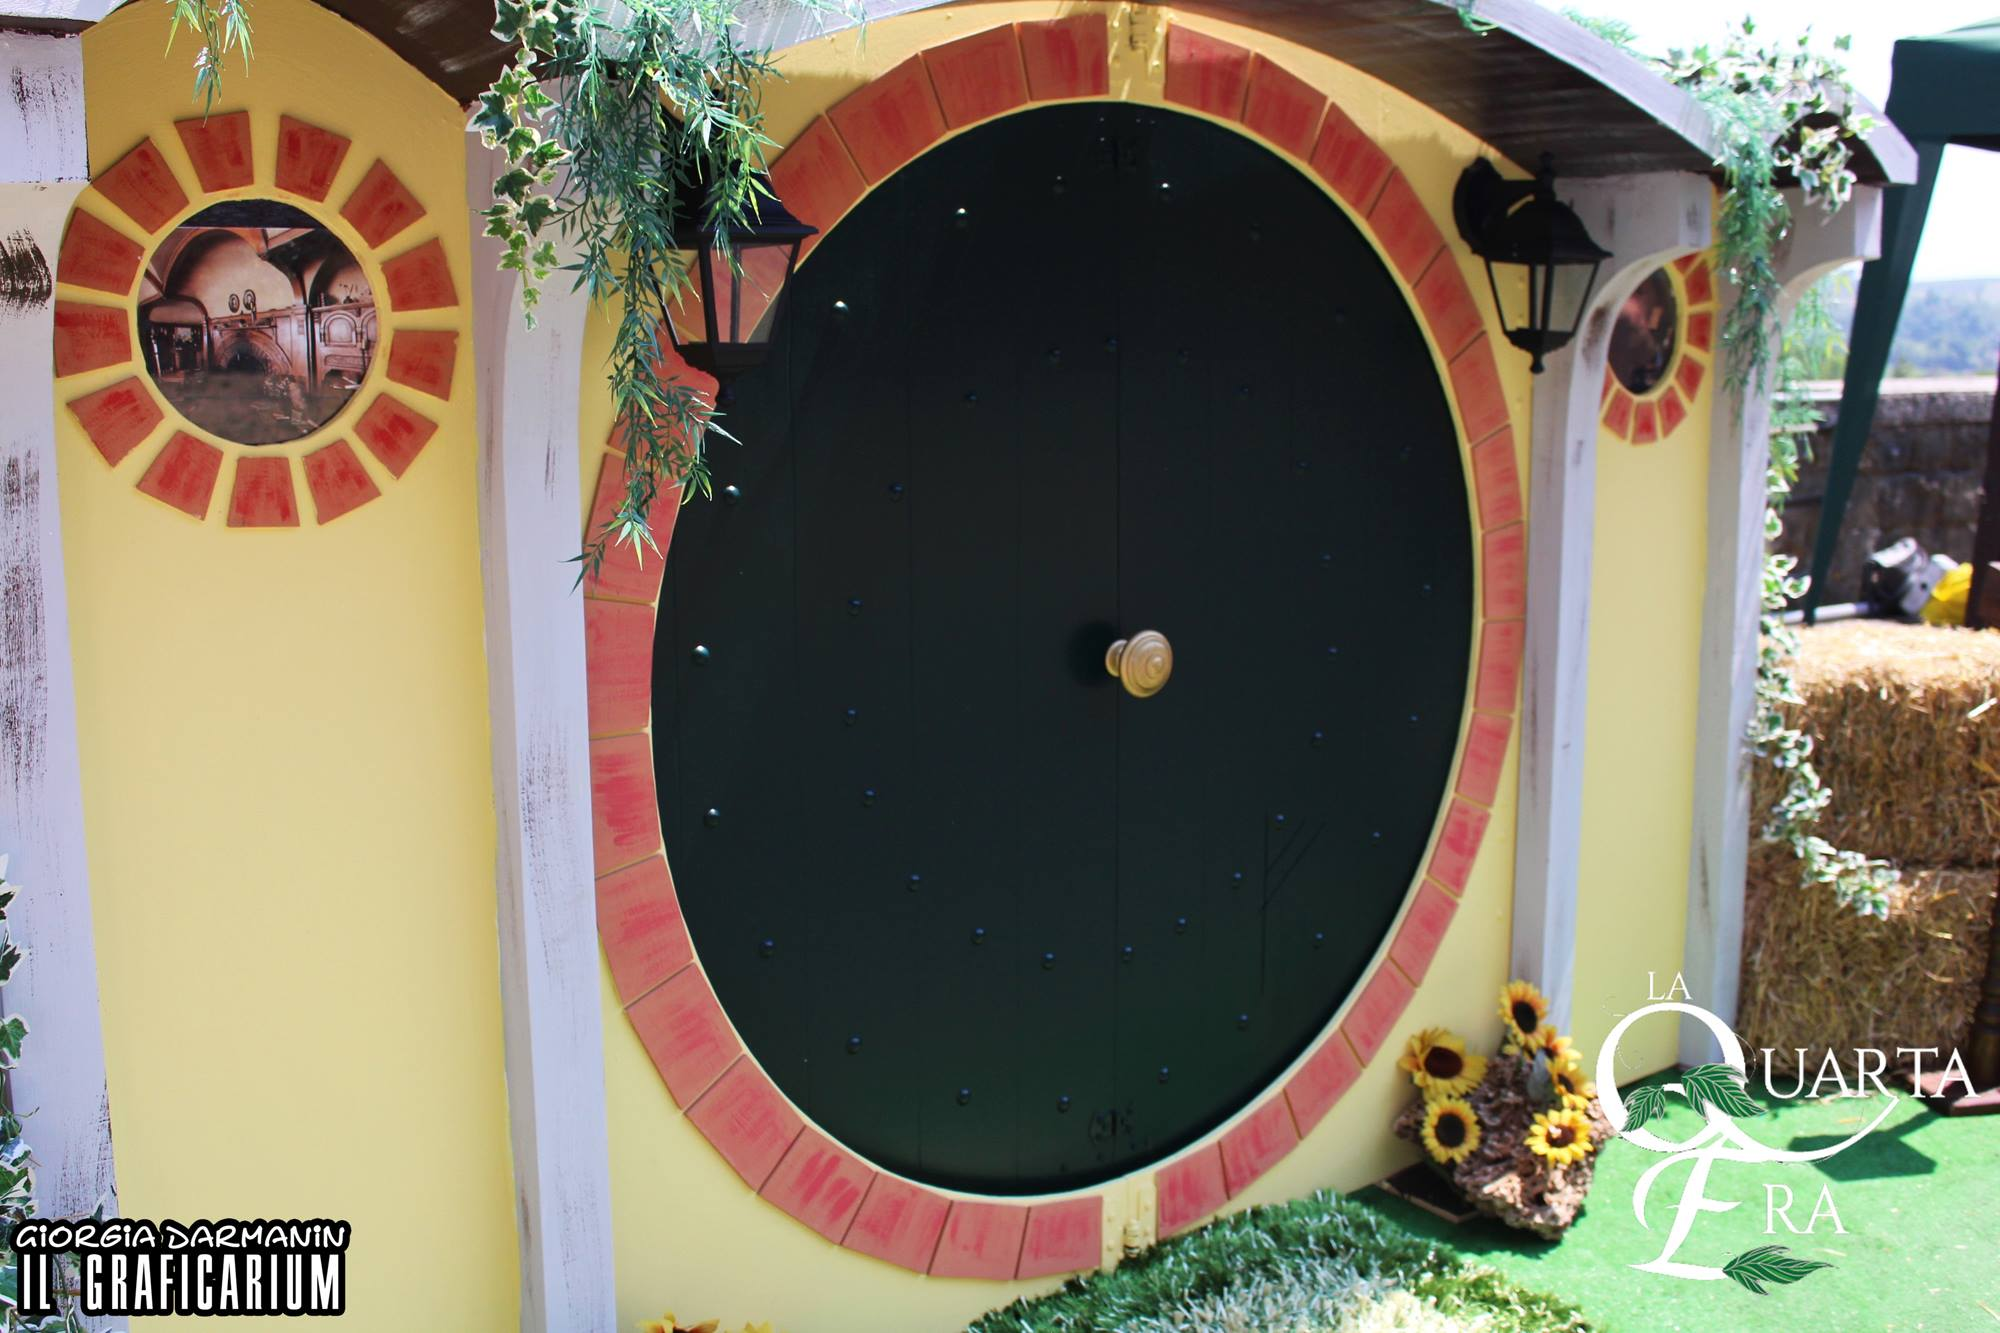 La Quarta Era - Scenografie - Porta di Casa Baggins